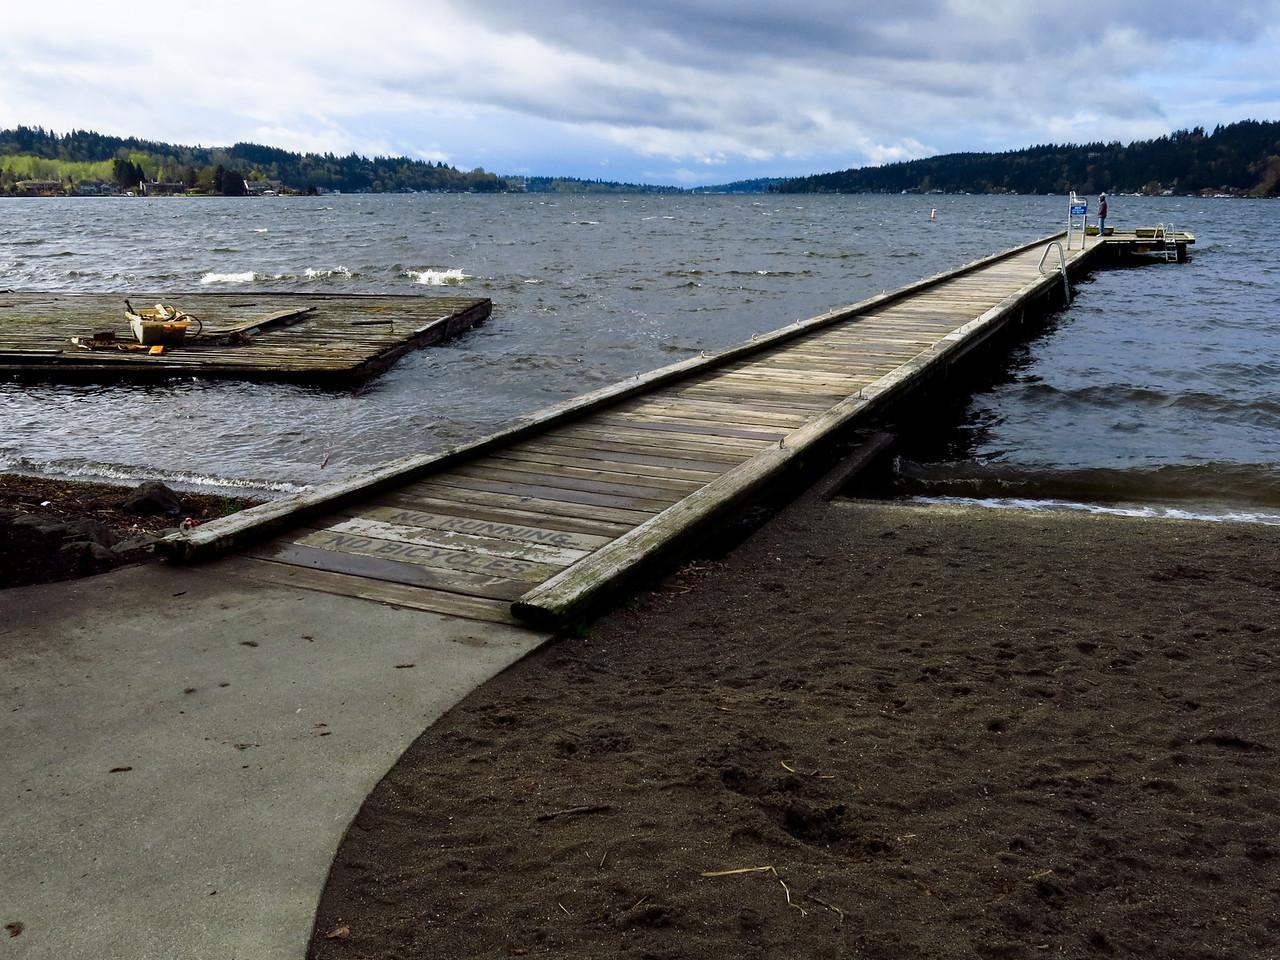 Looking south across the pier on Lake Washington at Entai Park.